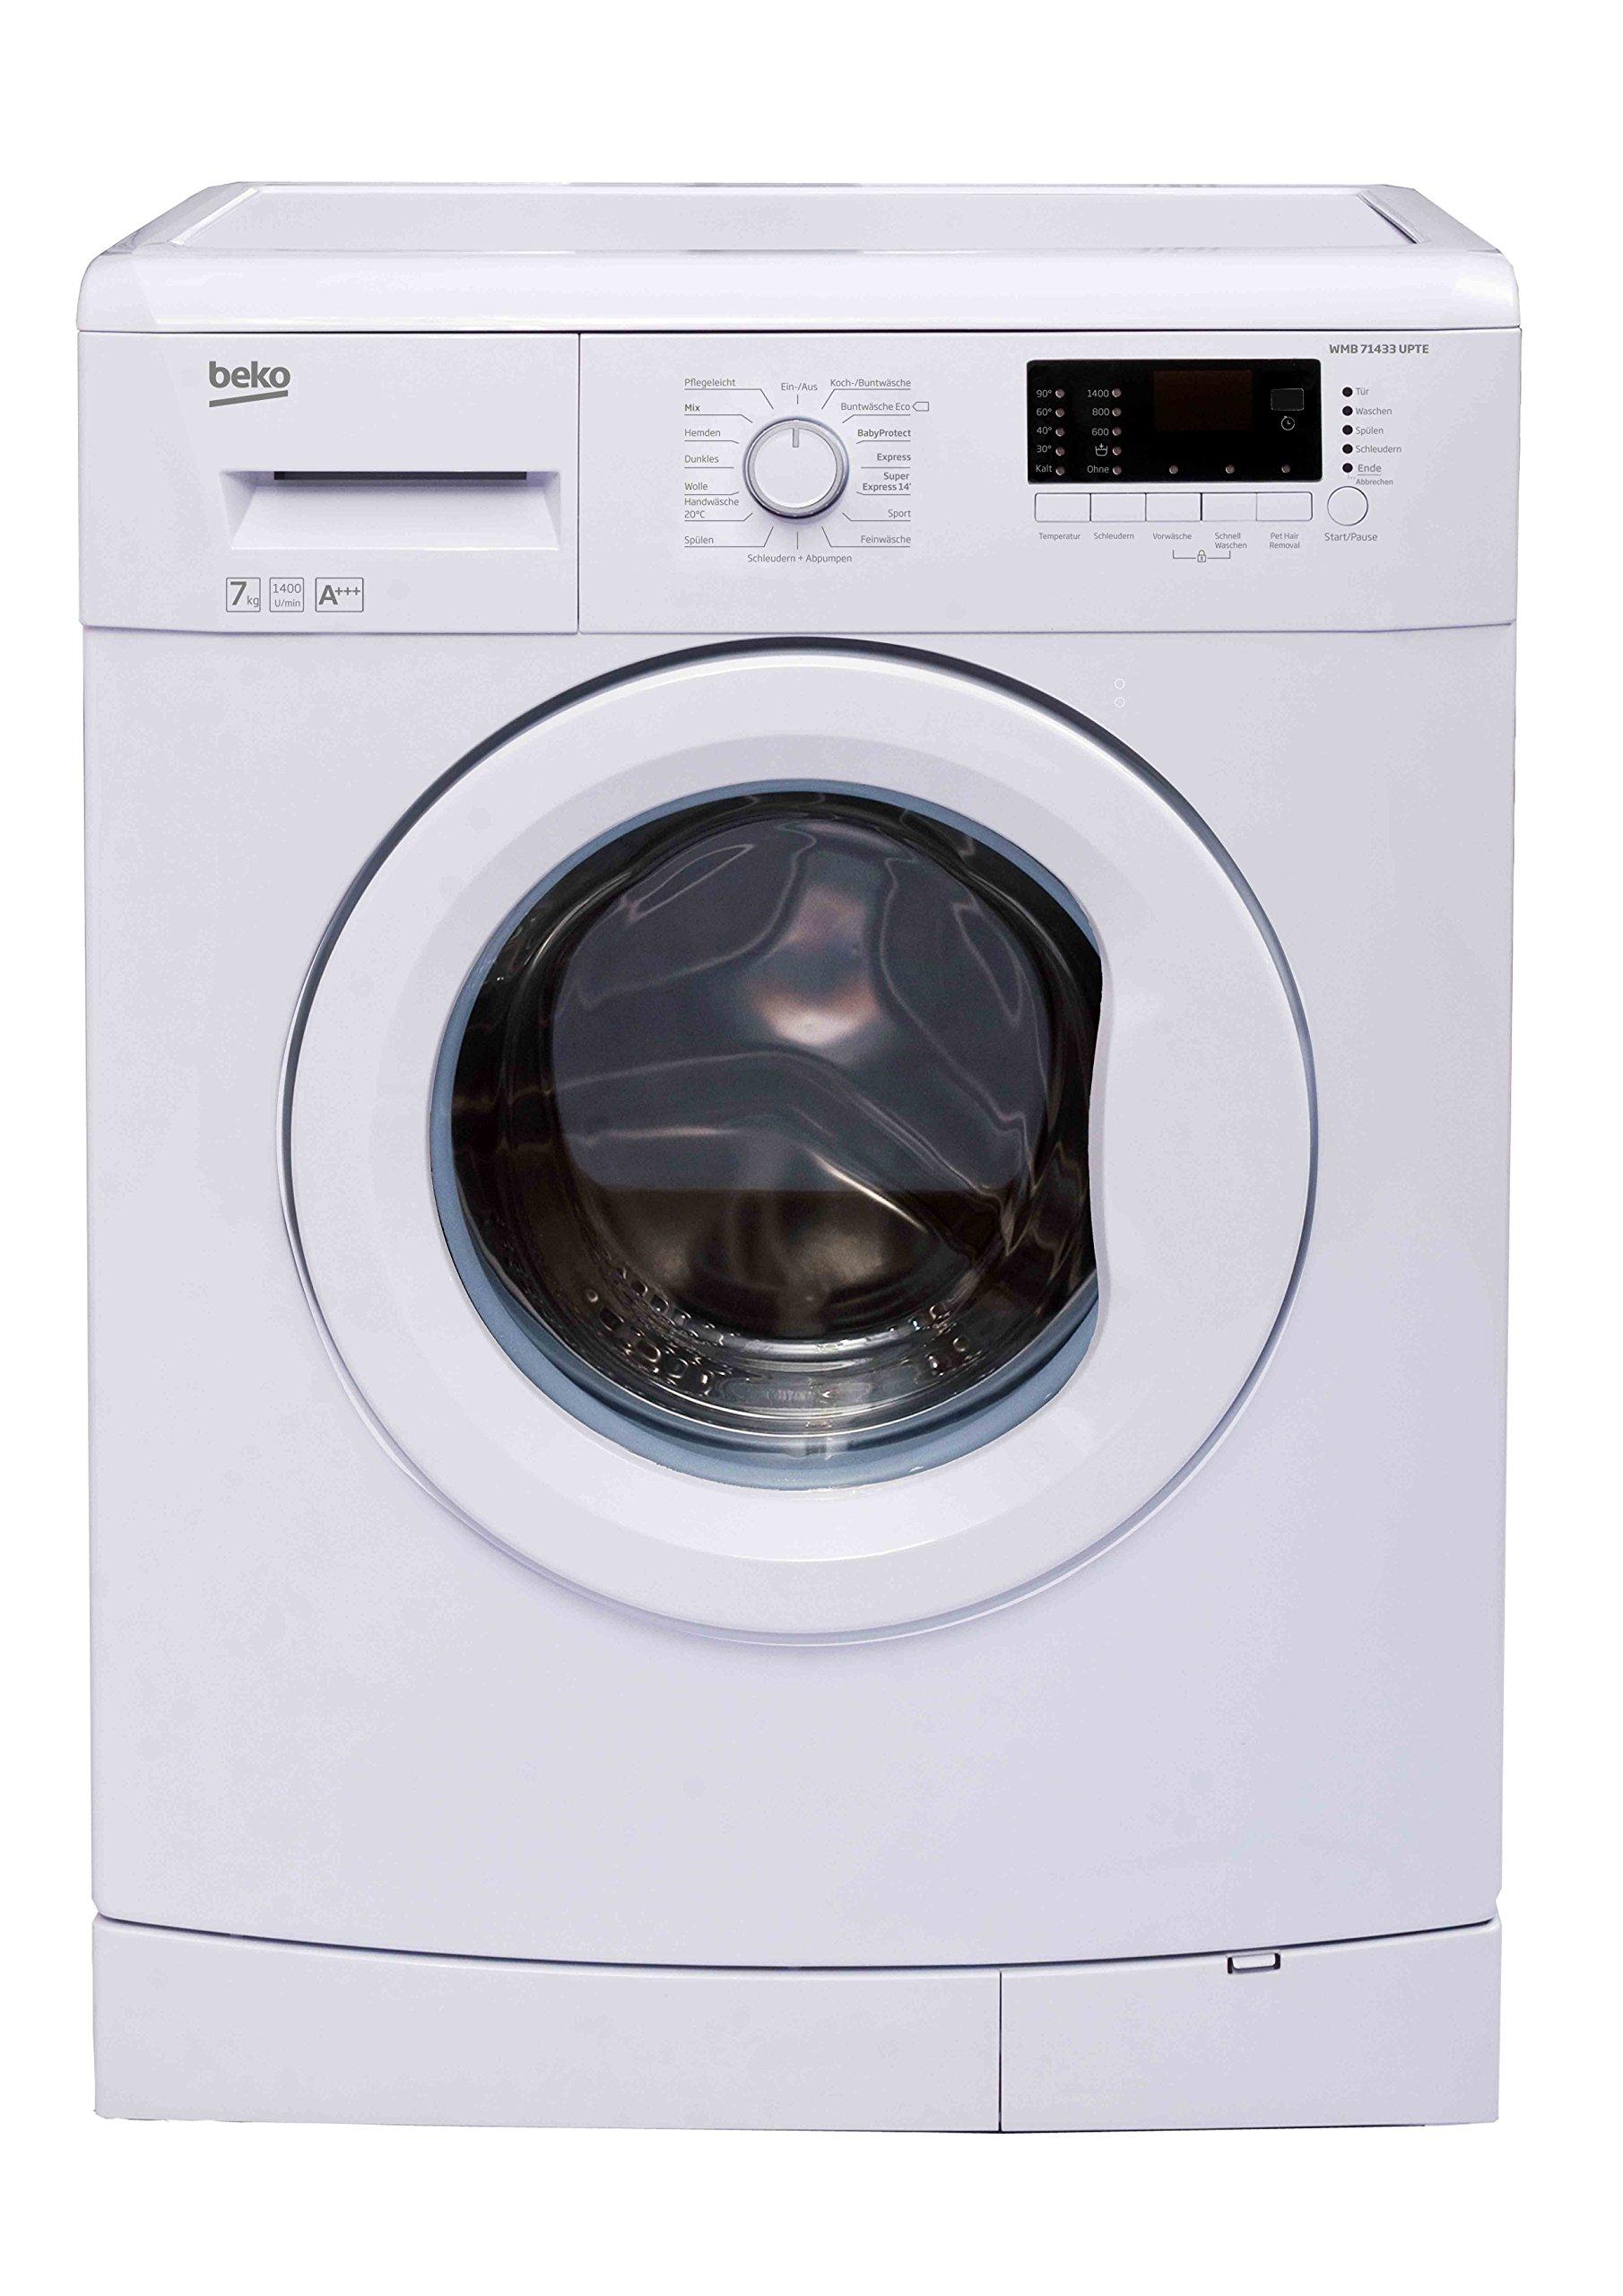 Beko-WMB-71433-UPTE-Waschmaschine-Frontlader-7kg-A-1400-UpM-Aquafusion-Mengenautomatik-15-Programme-BabyProtect-Waschen-Watersafe